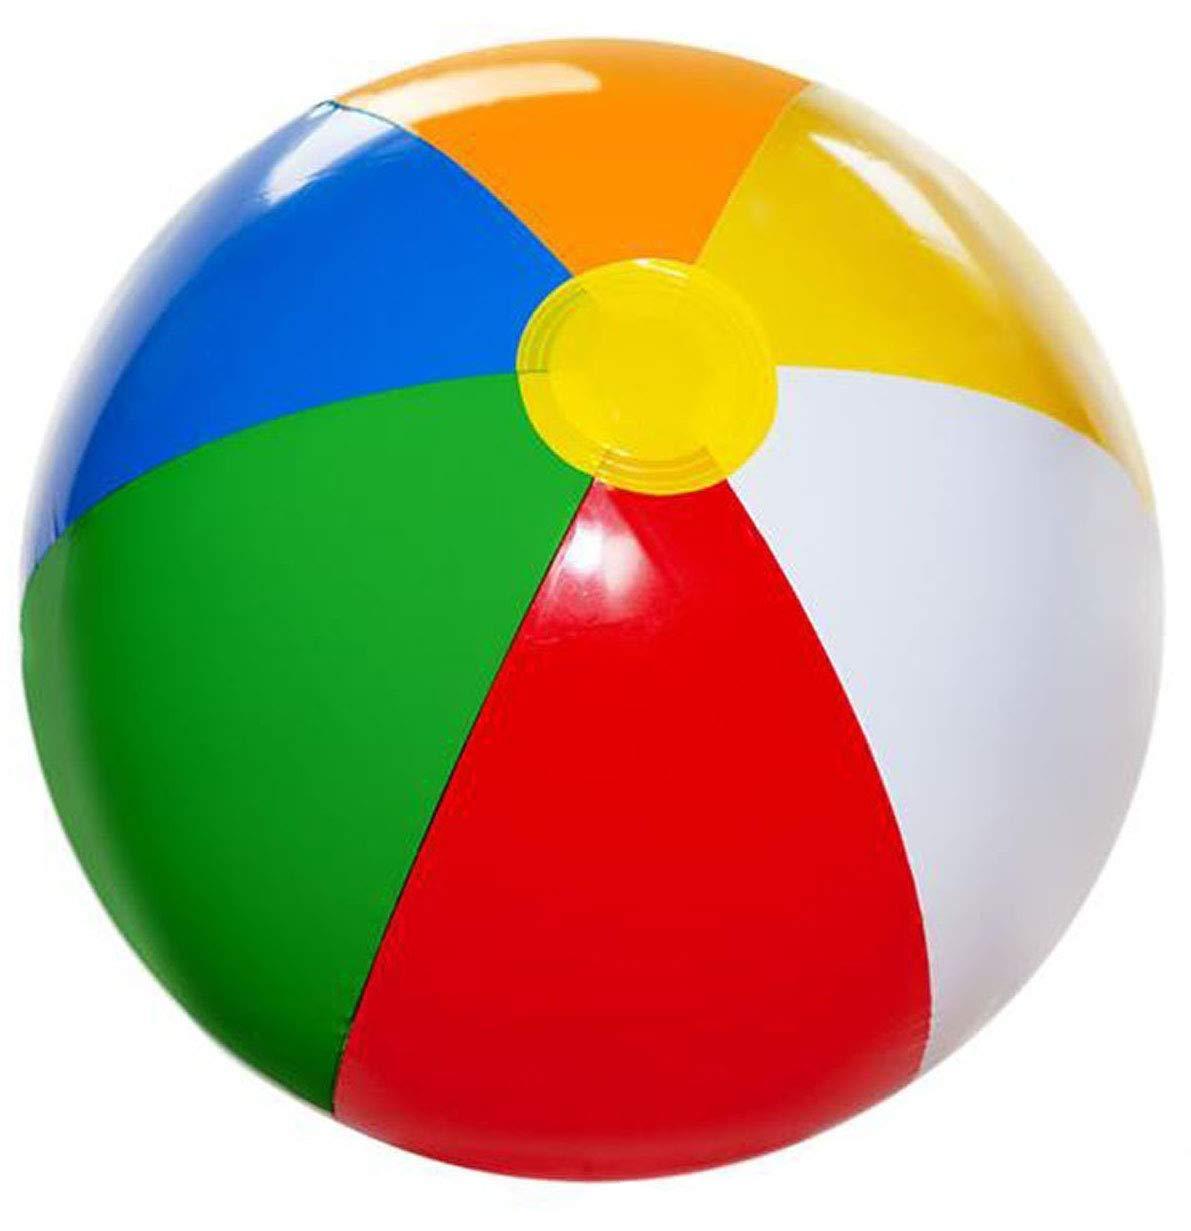 beach ball image - 679×702